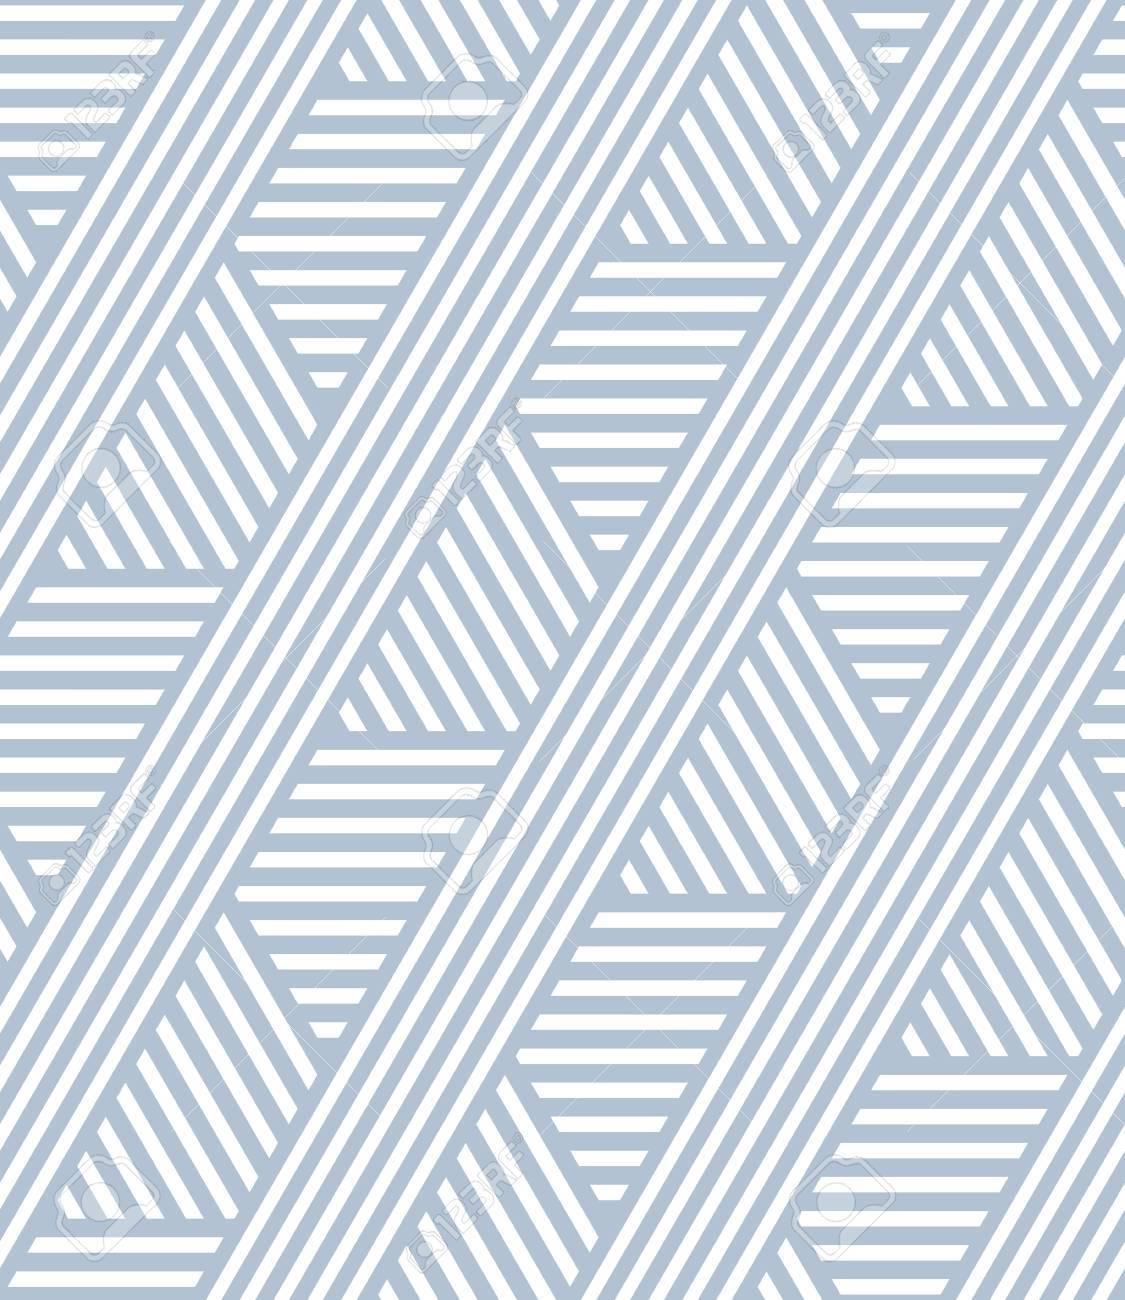 Seamless striped lines pattern. Geometric texture. Vector art. - 71133169